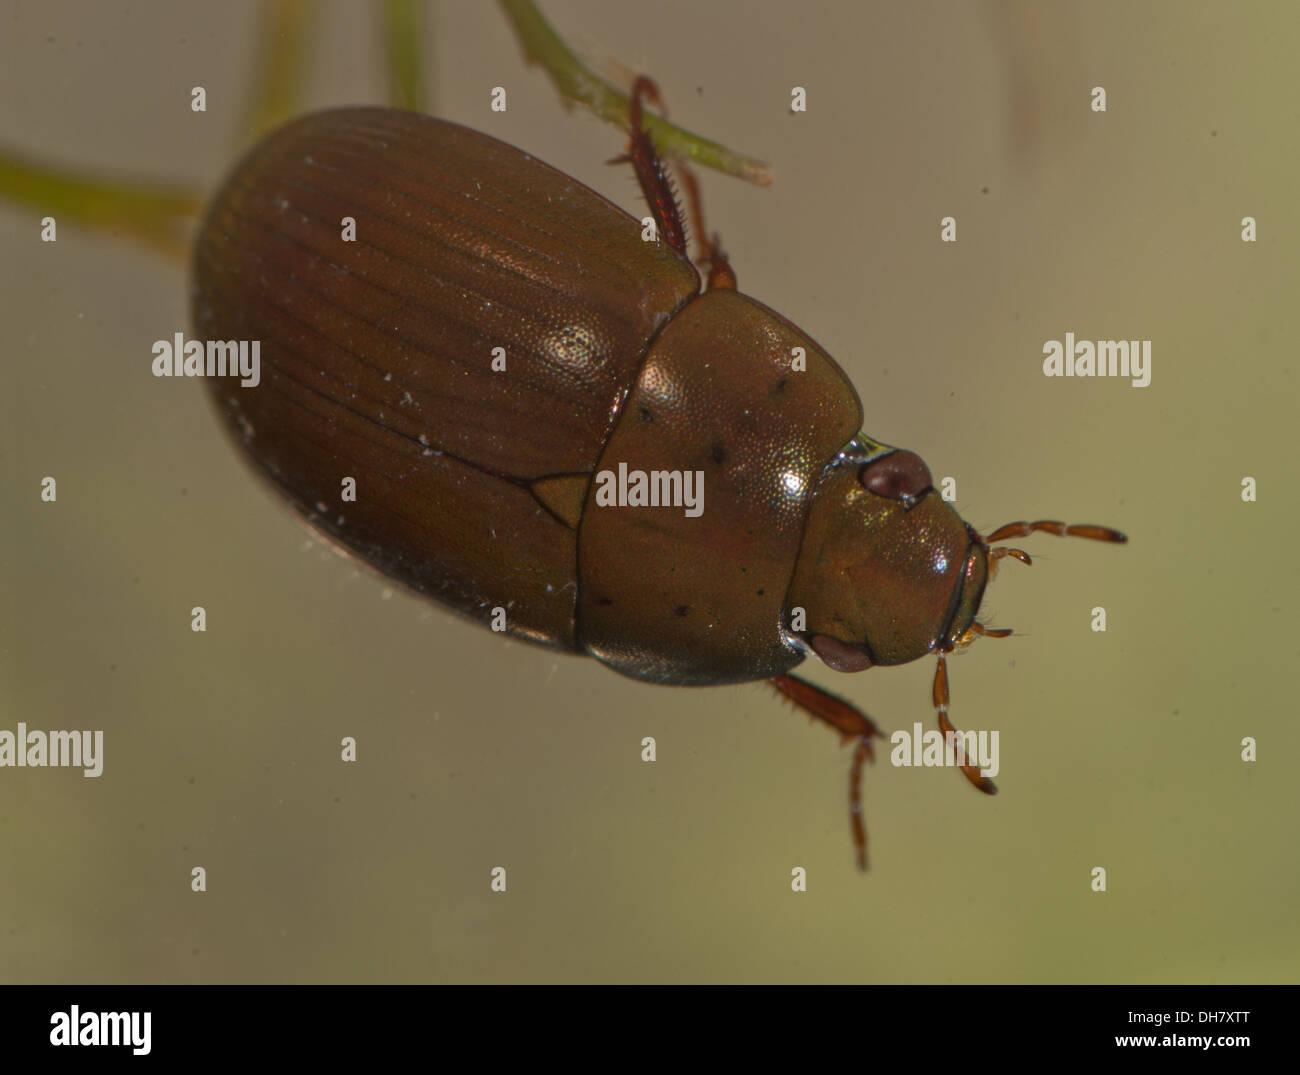 Water Scavenger Beetle Larvae